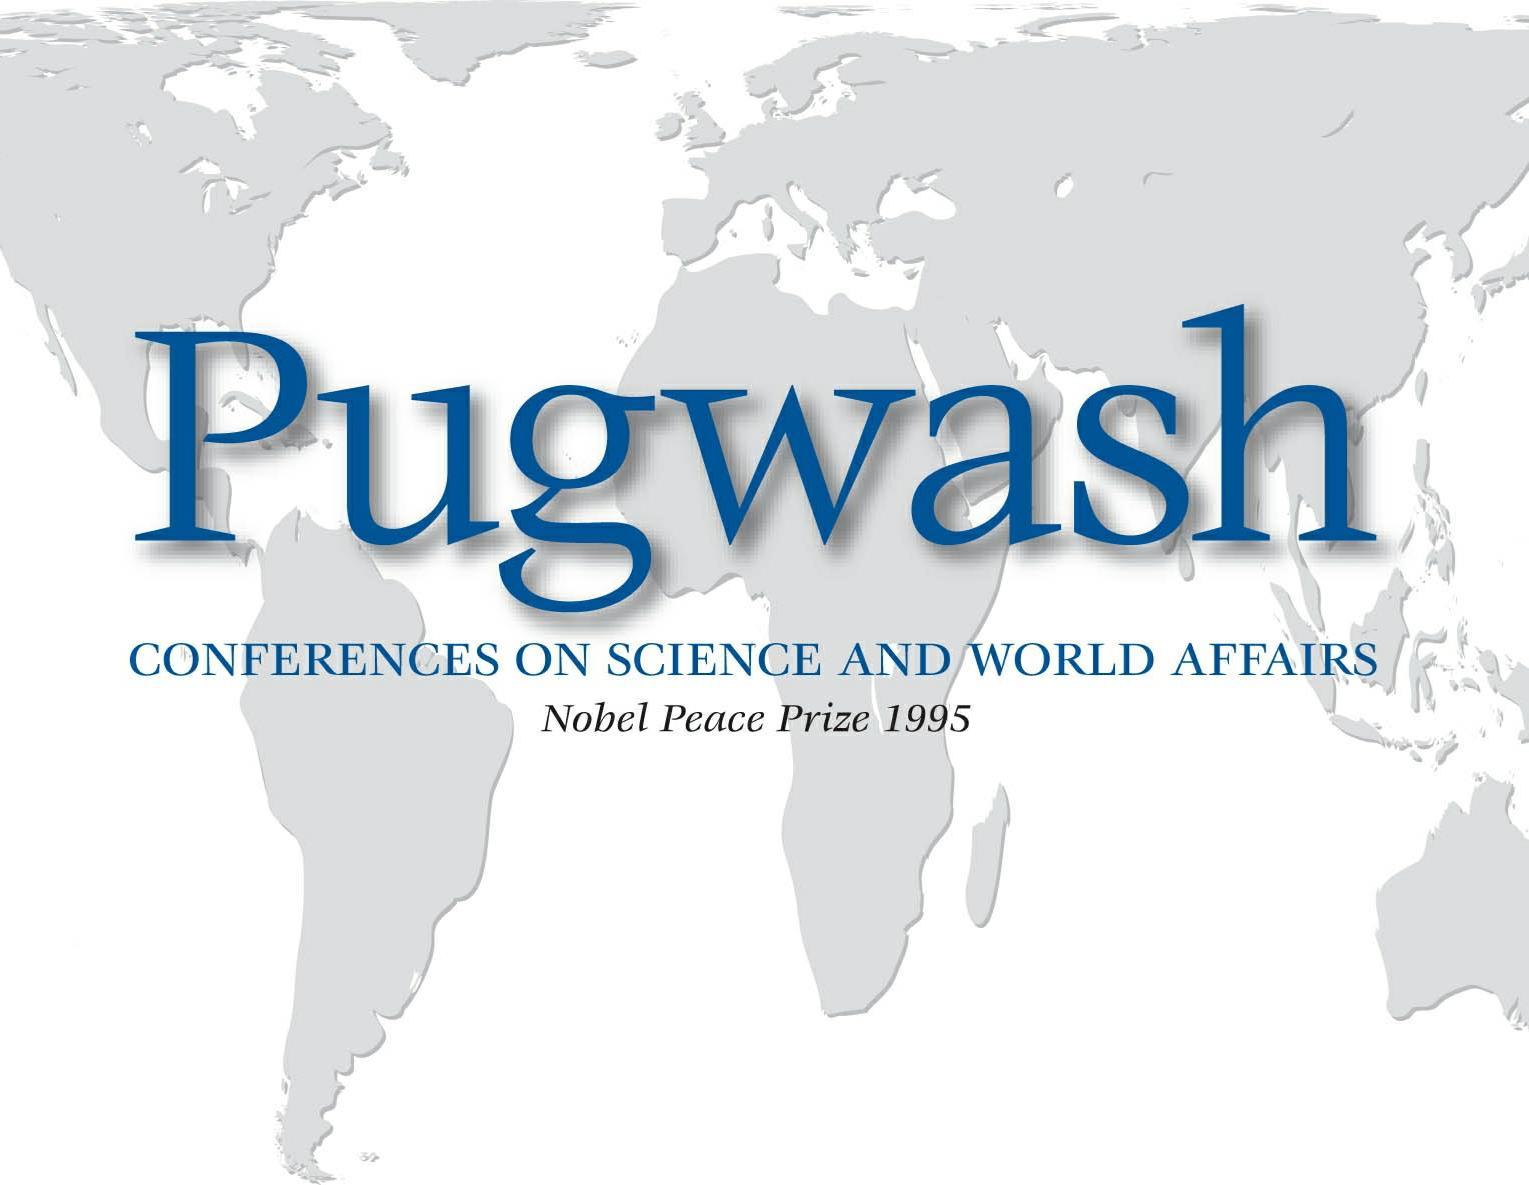 Pugwash [SOCIETÀ CIVILE] dichiarazione @ONU